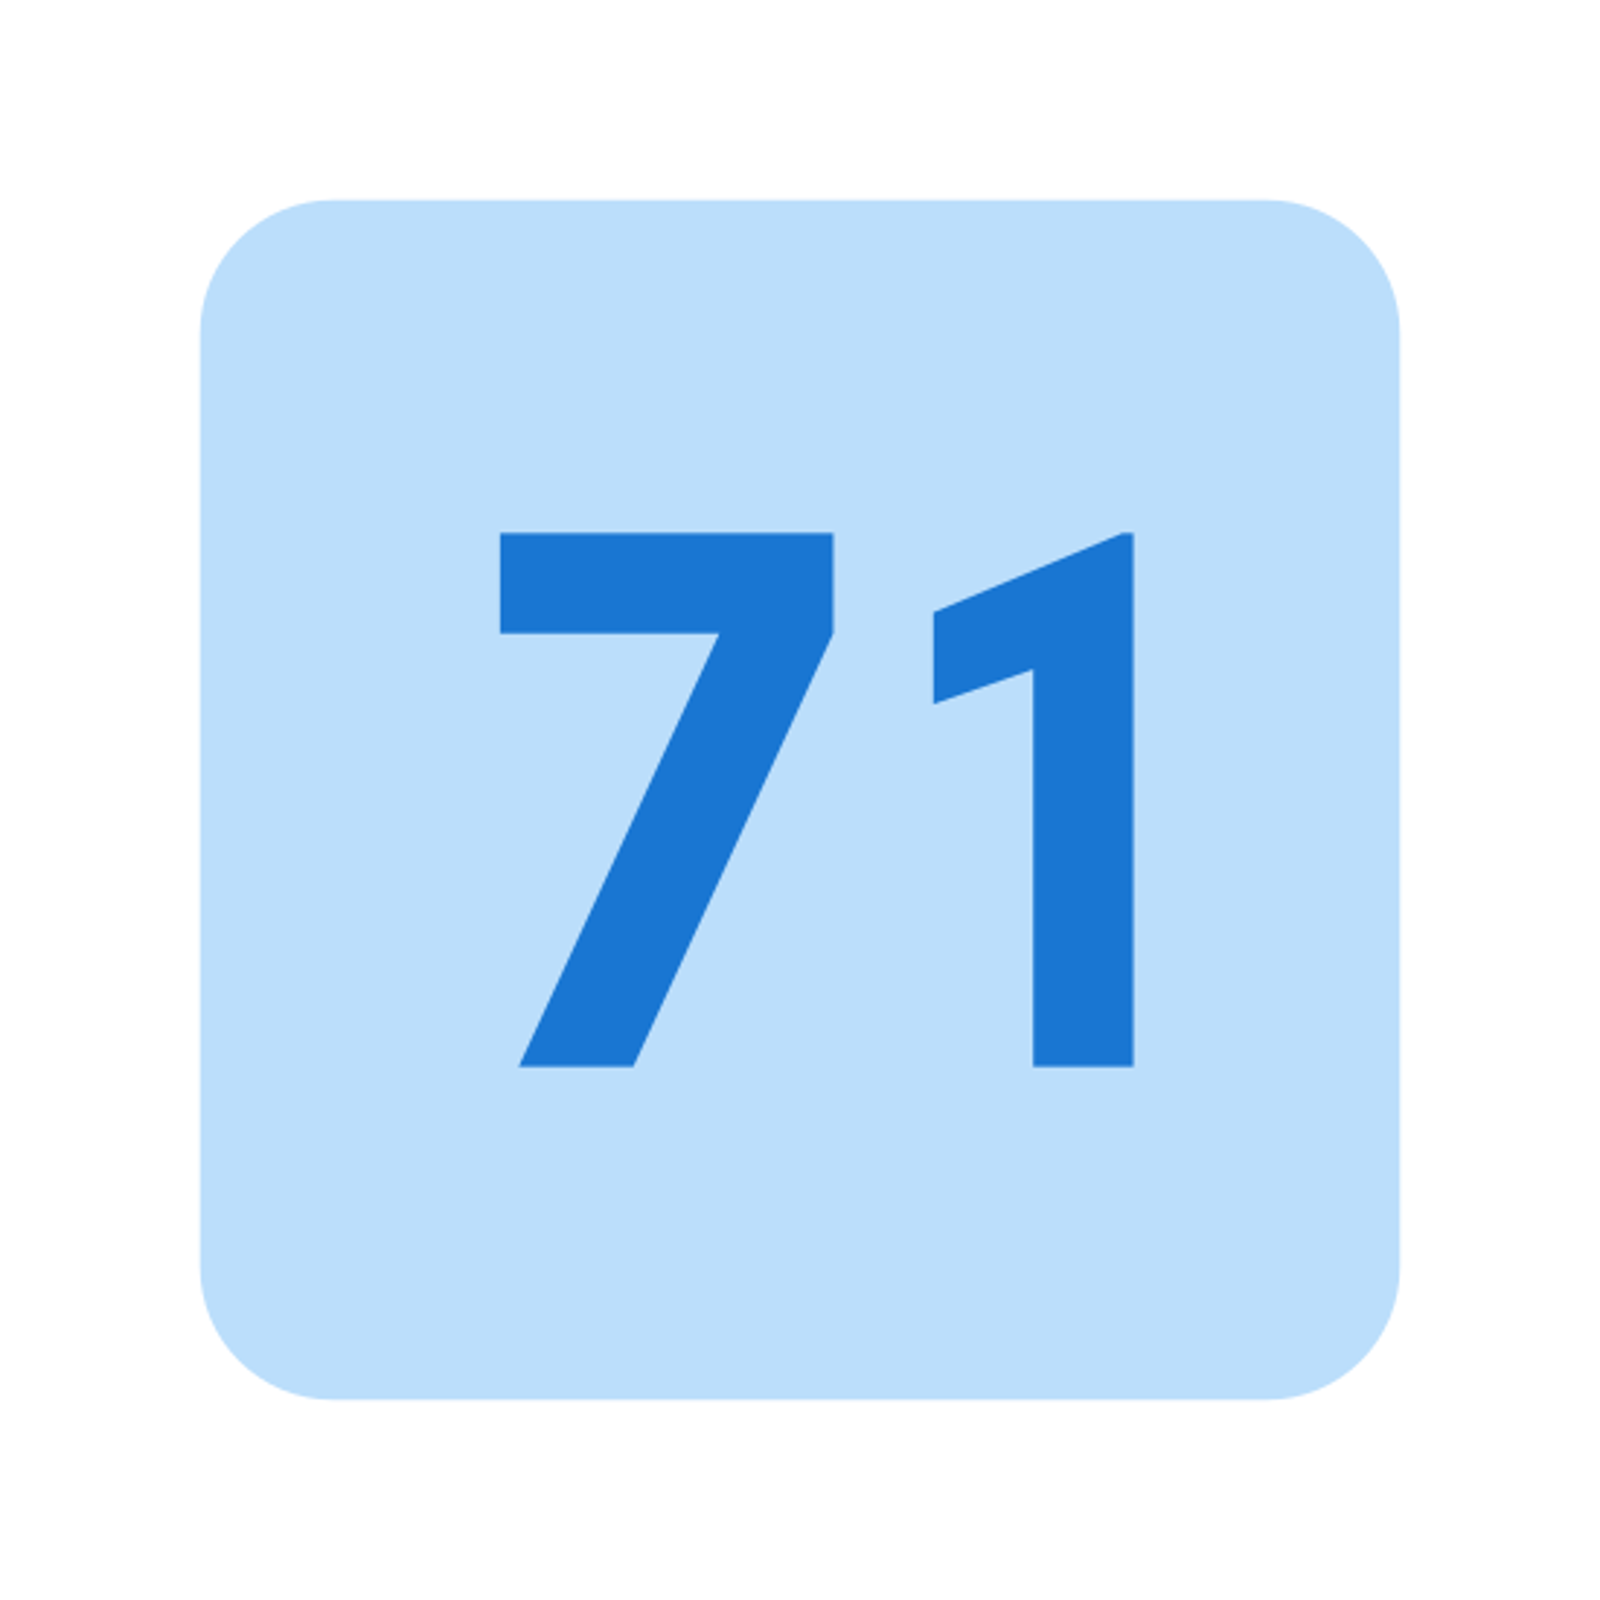 71 icon